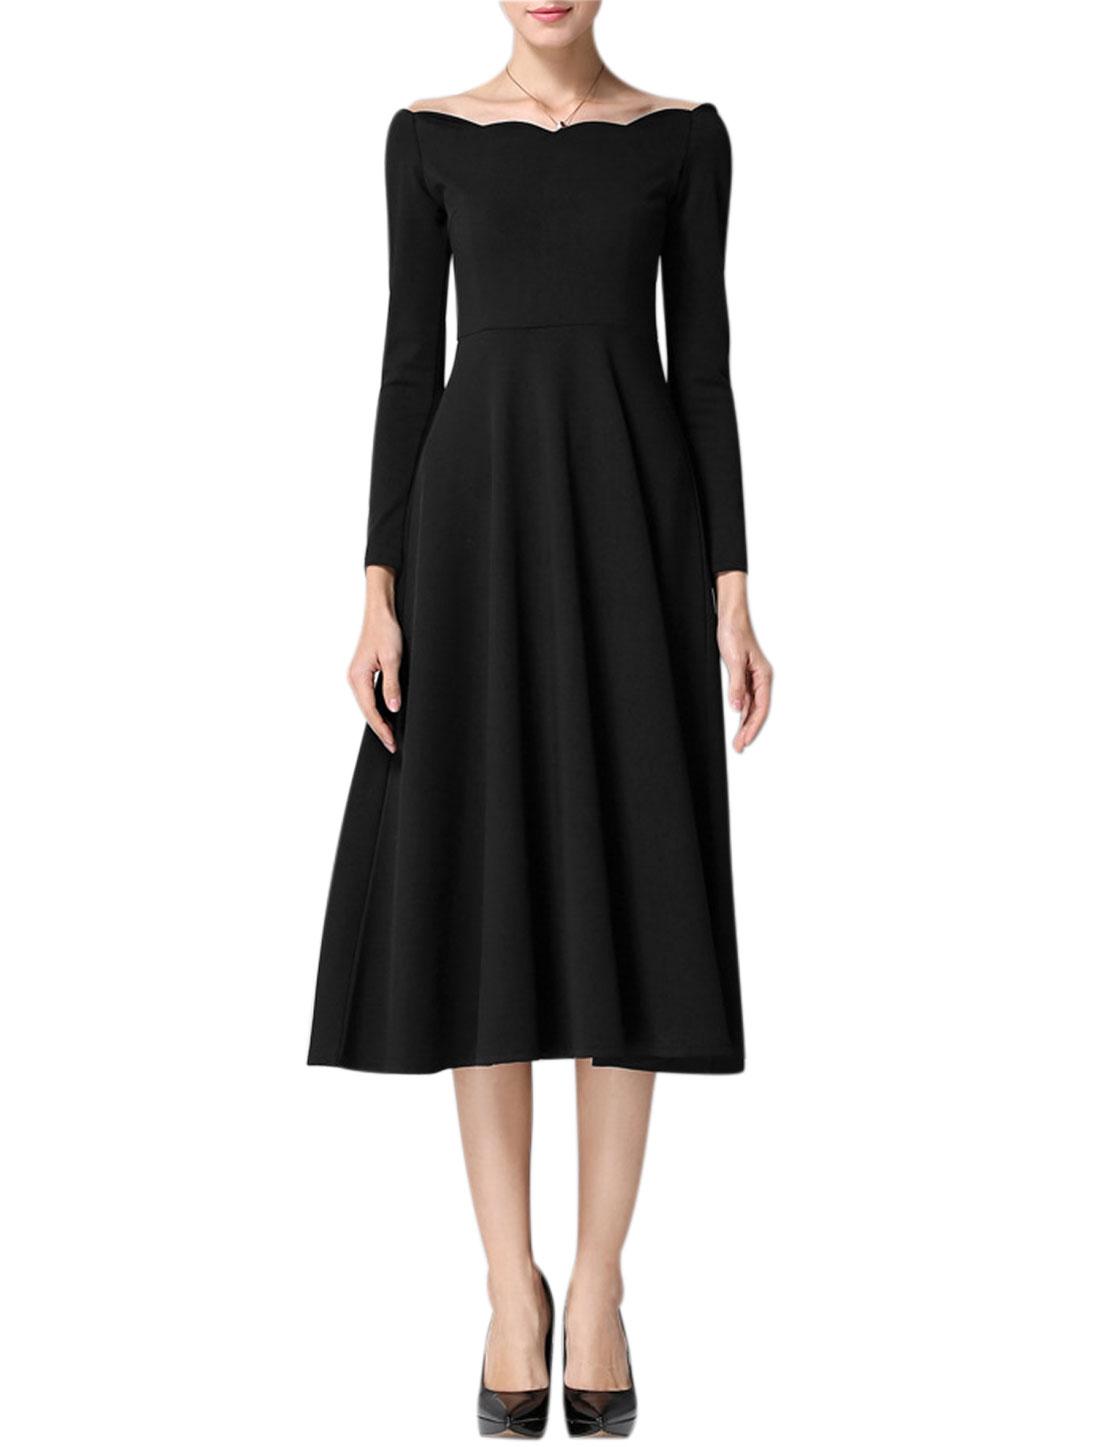 Woman Scalloped Boat Neck Bracelet Sleeves Midi Dress Black M